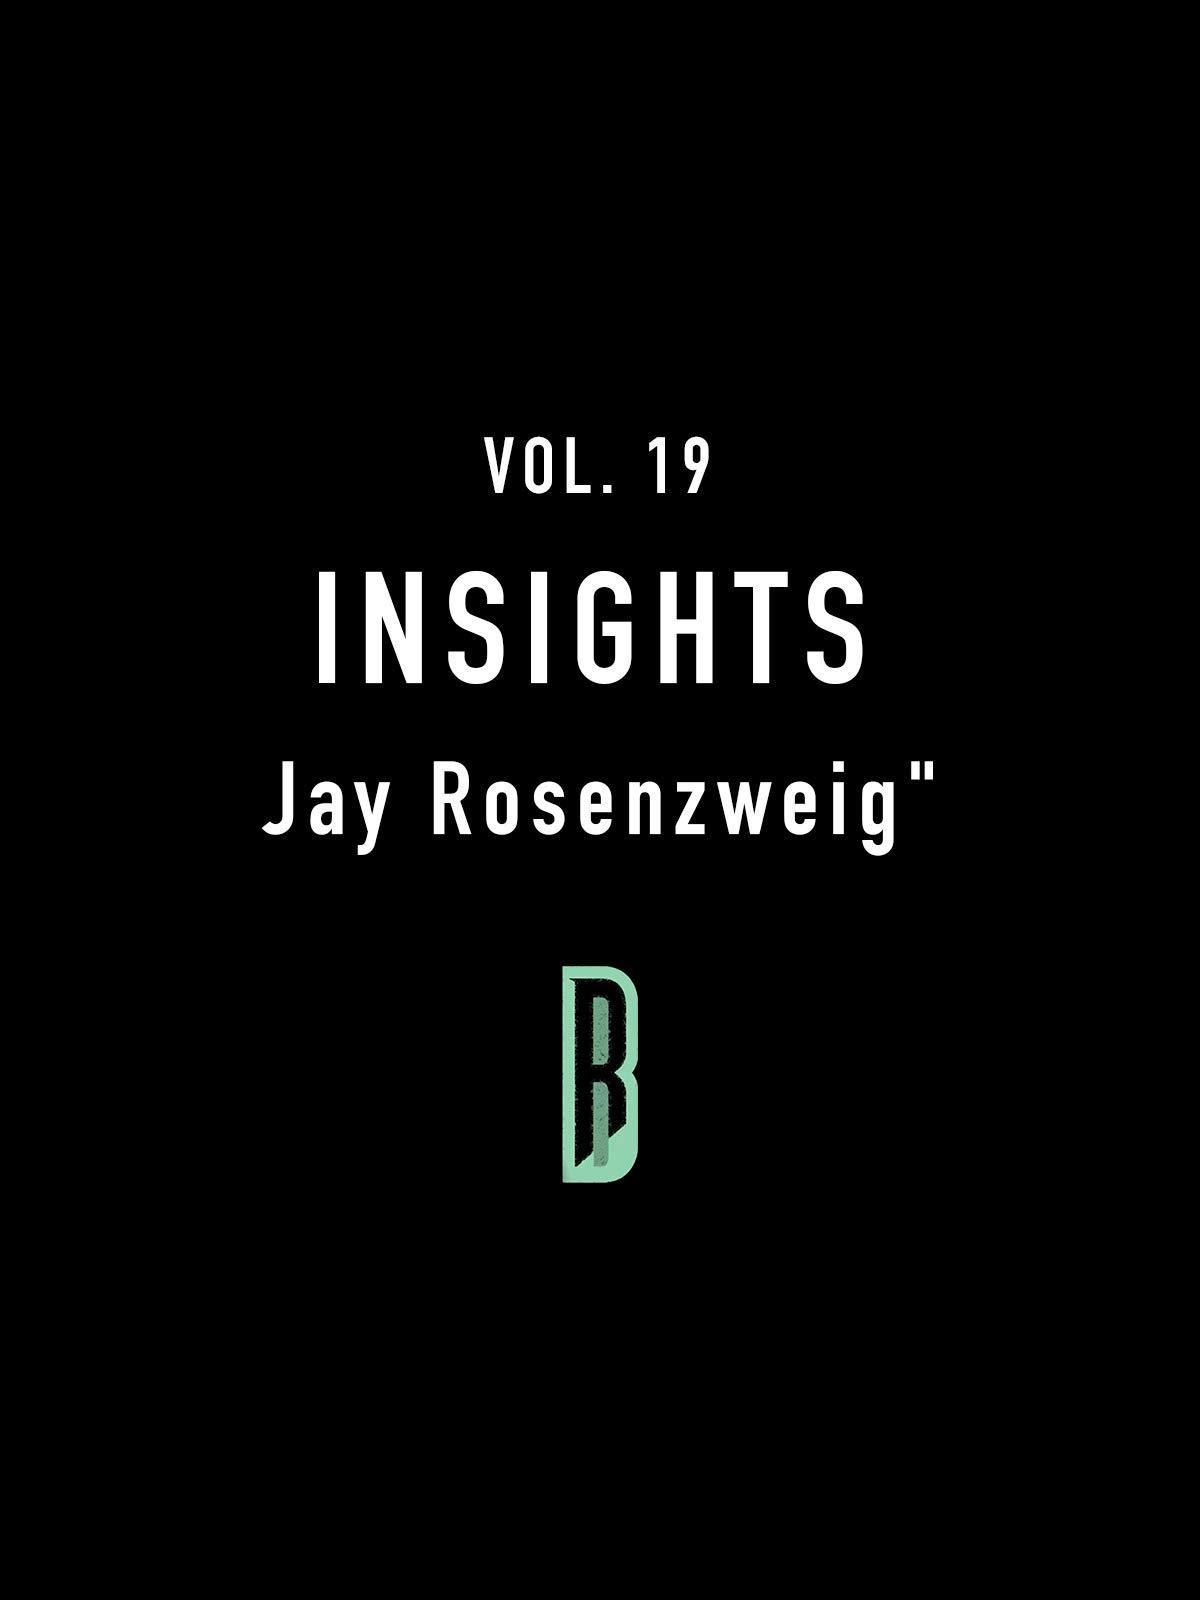 Insights Vol. 19